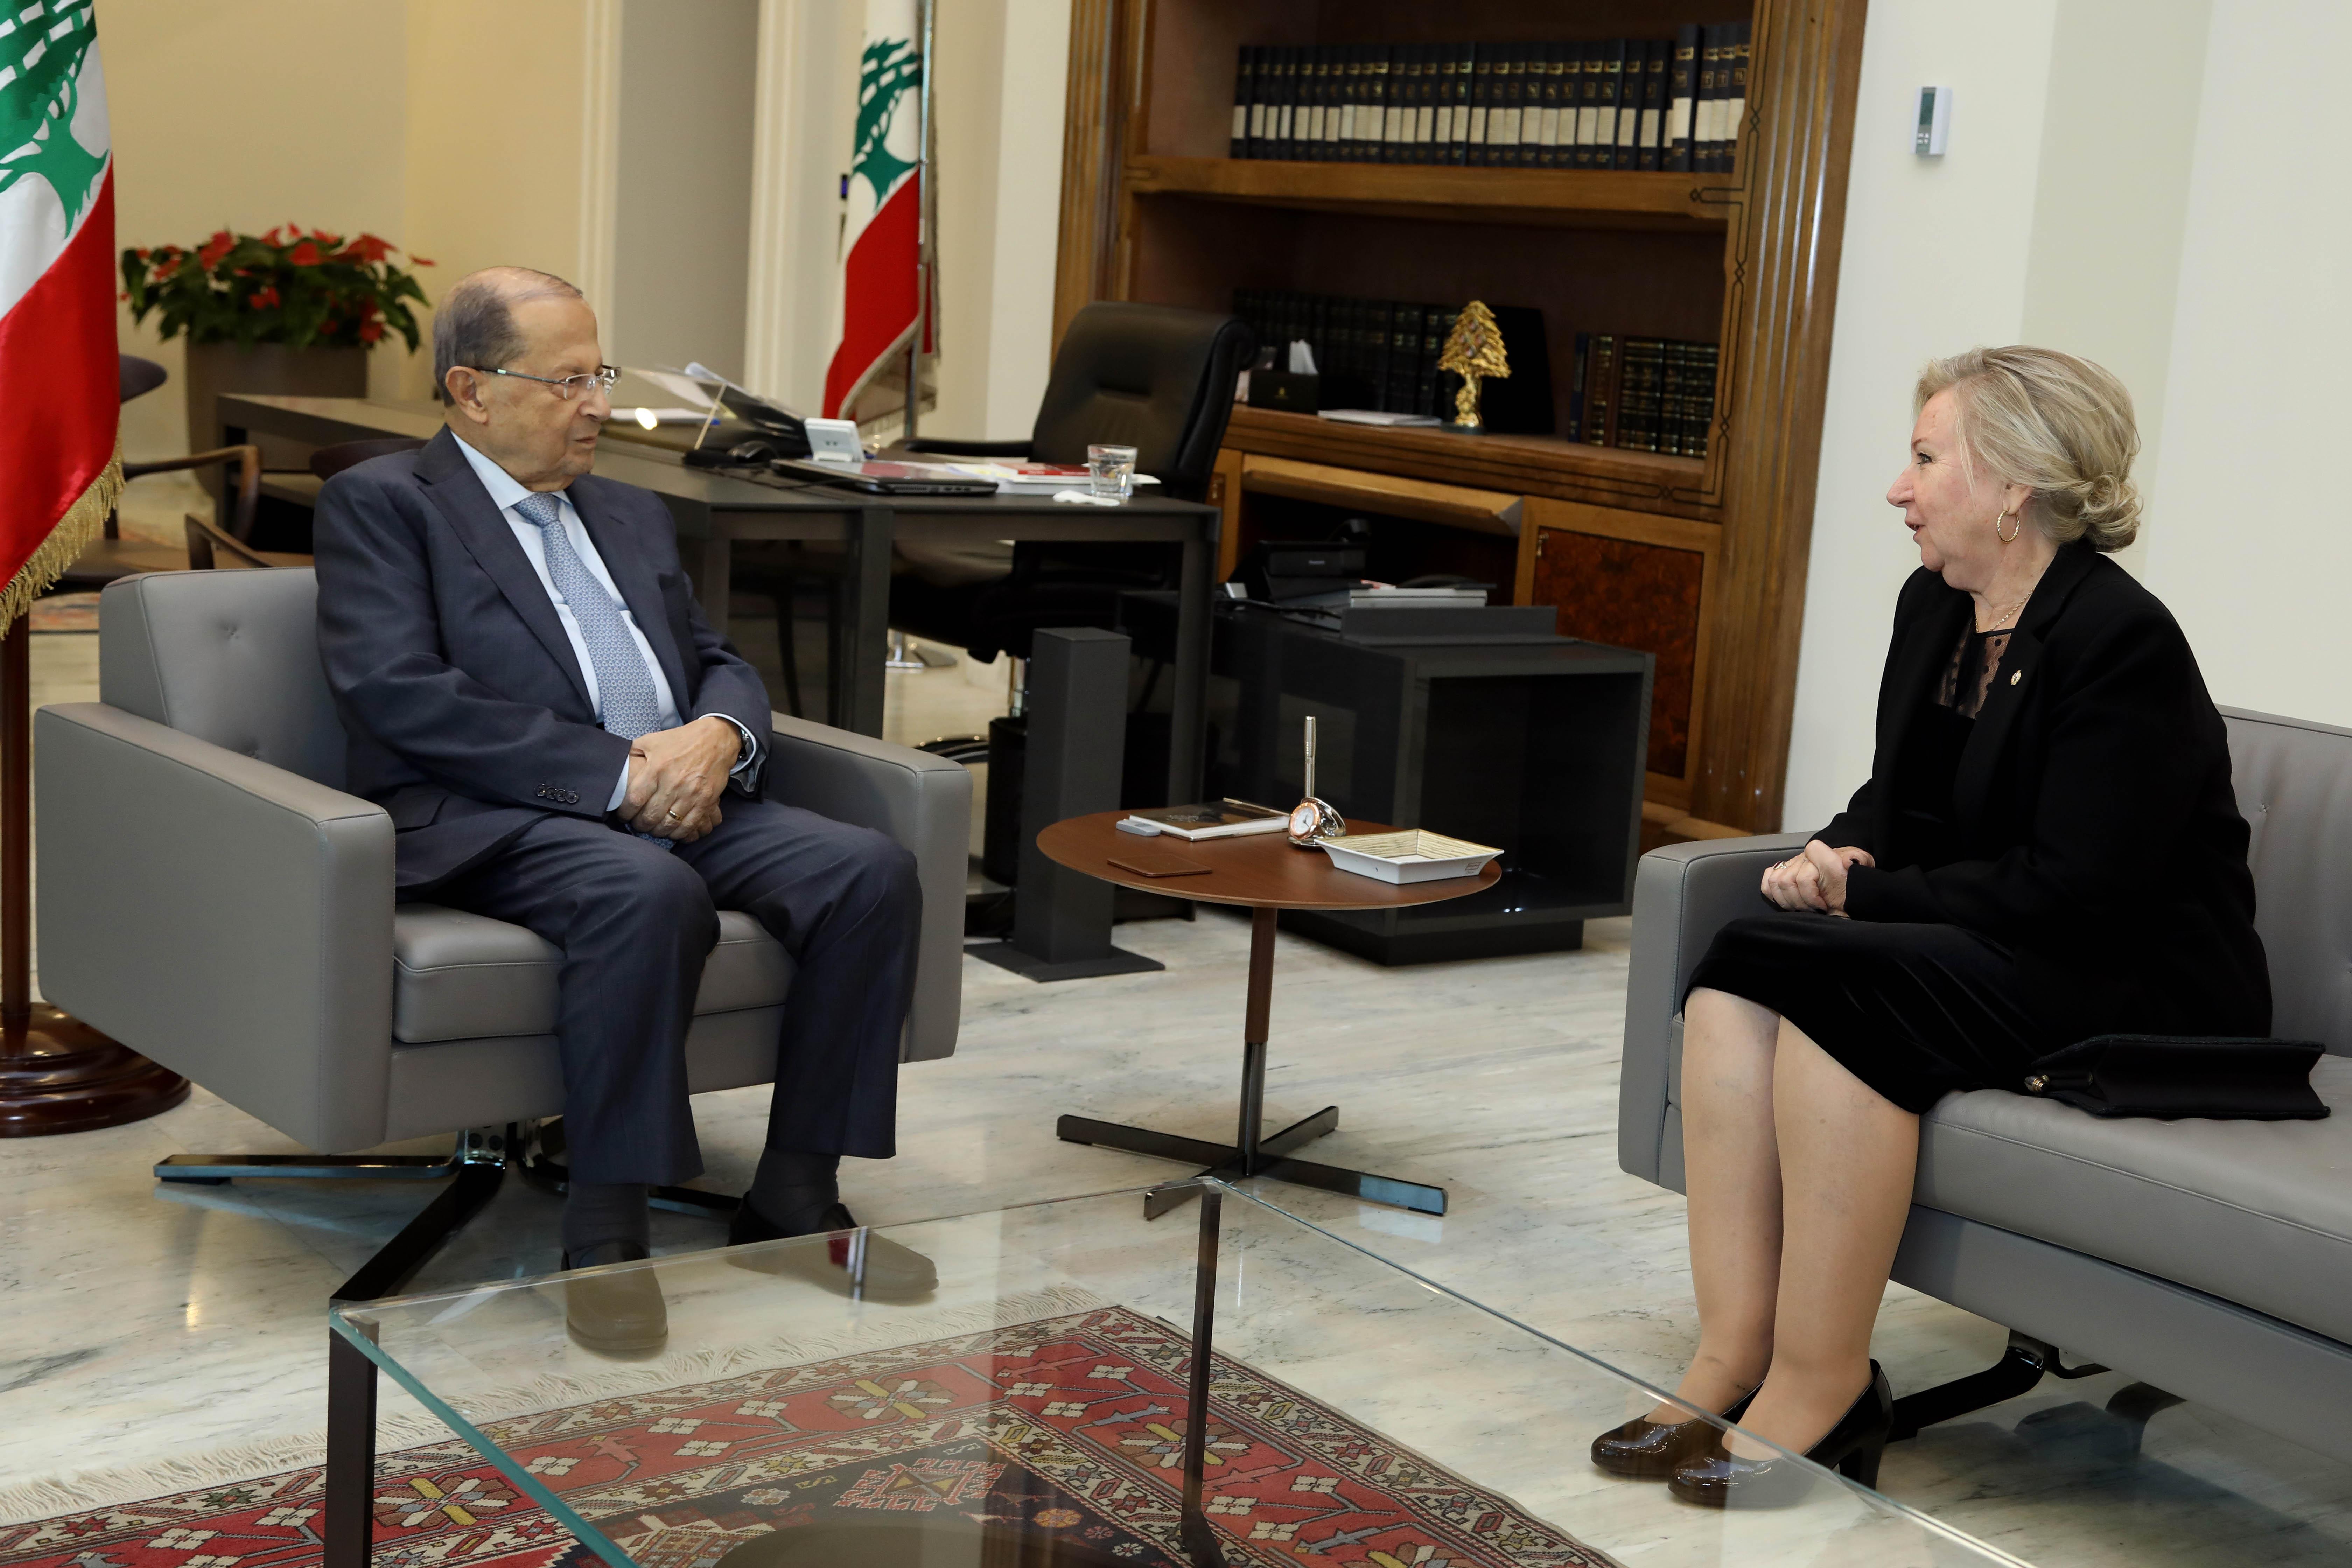 2 - Marta Ines Pizzaneli Ambassador of Uruguay to Lebanon